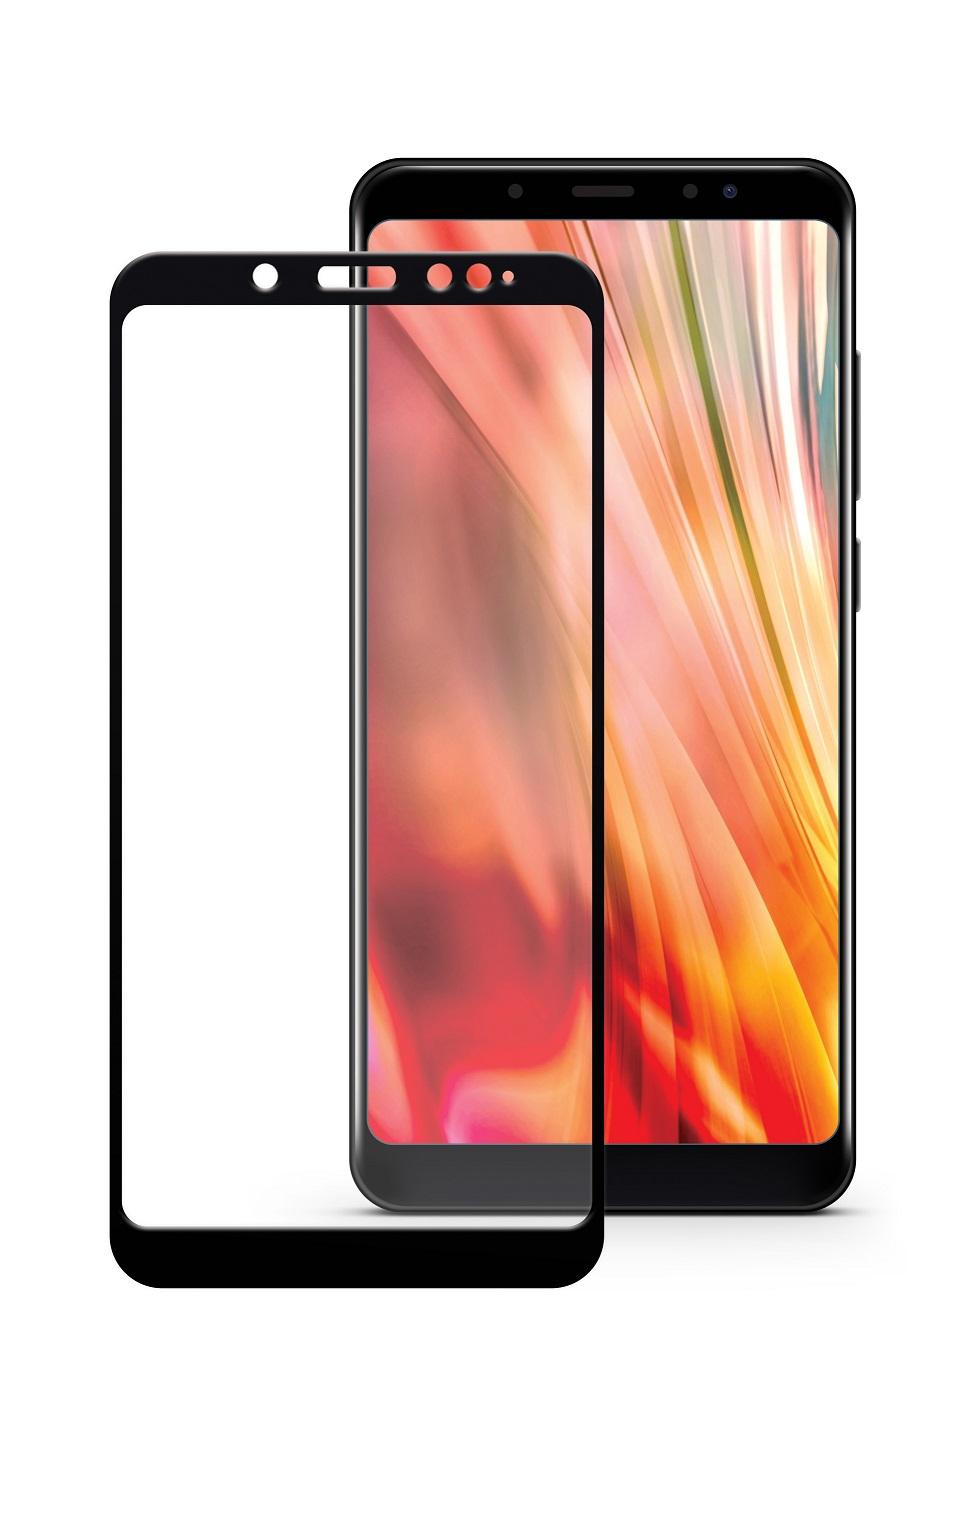 Защитное стекло Mobius для Xiaomi Redmi S2 3D Full cover (Black) аксессуар защитное стекло mobius для honor 7c pro 3d full cover black 4232 208